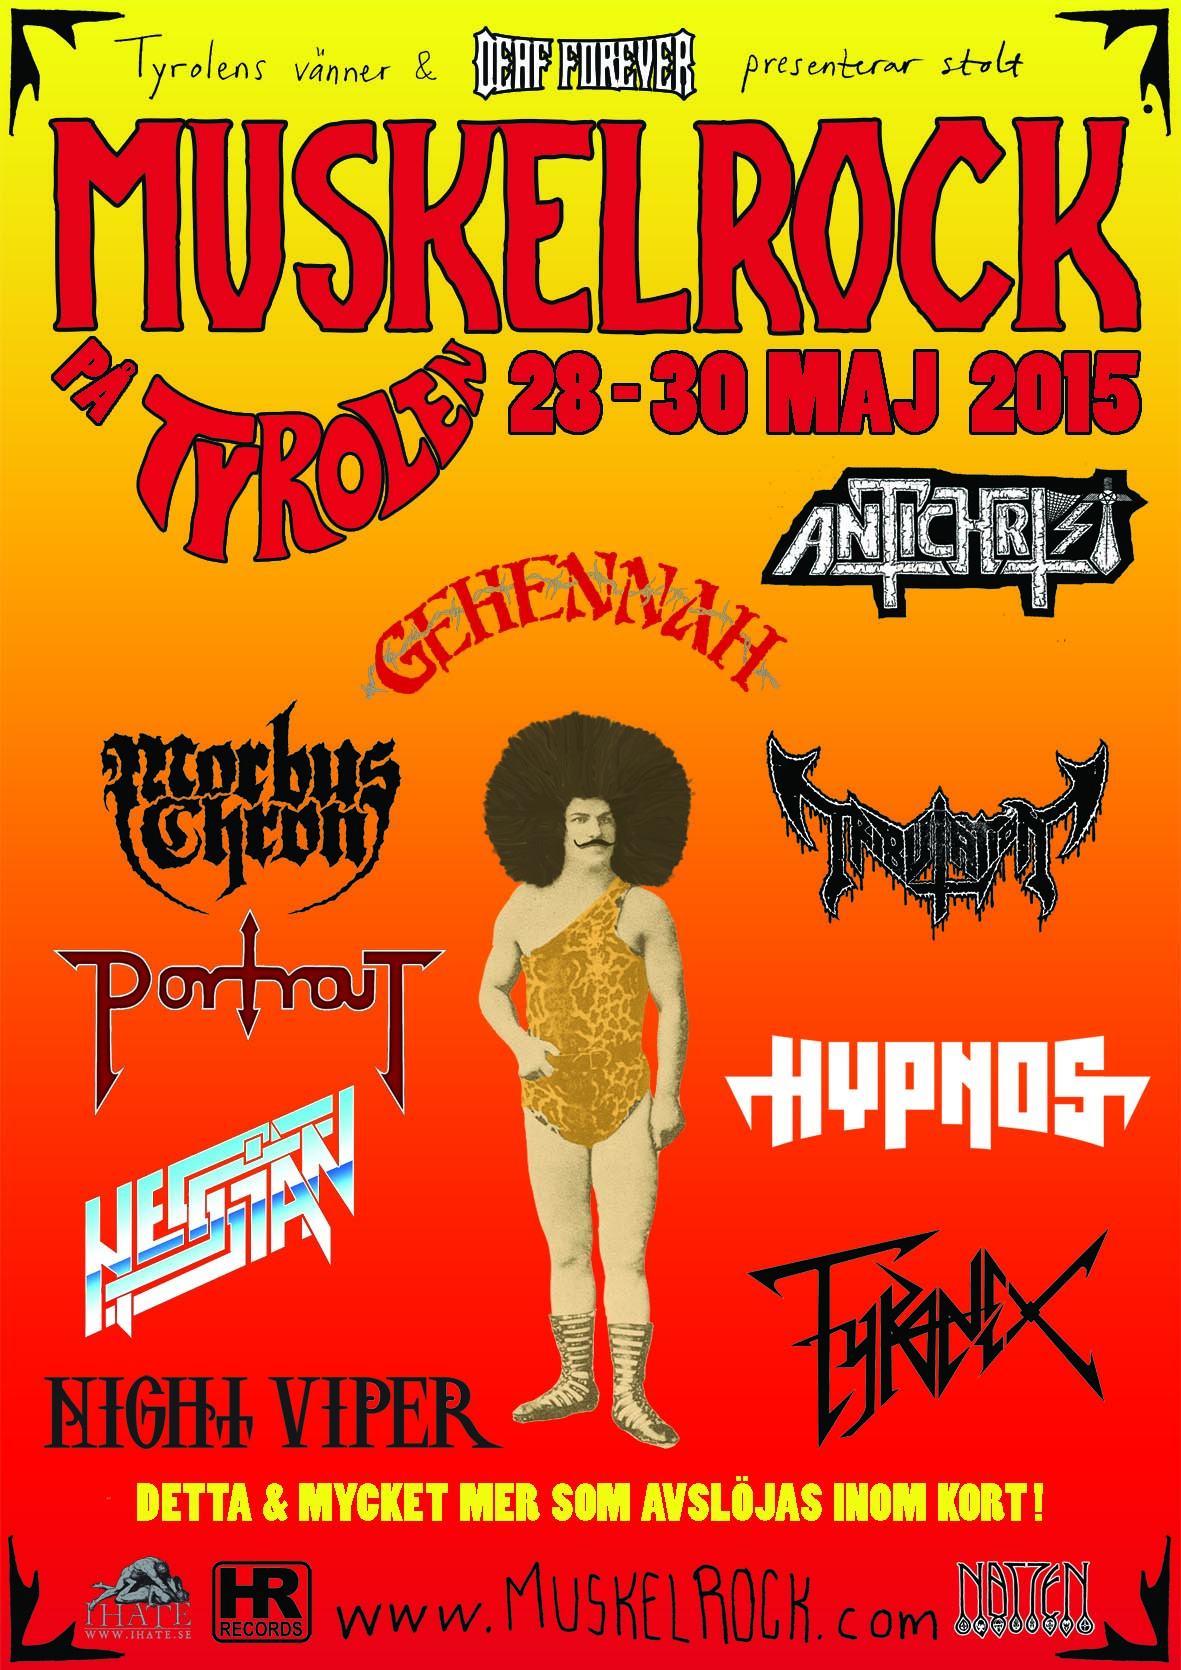 3ae8389ab5-Muskelrock 2015 web